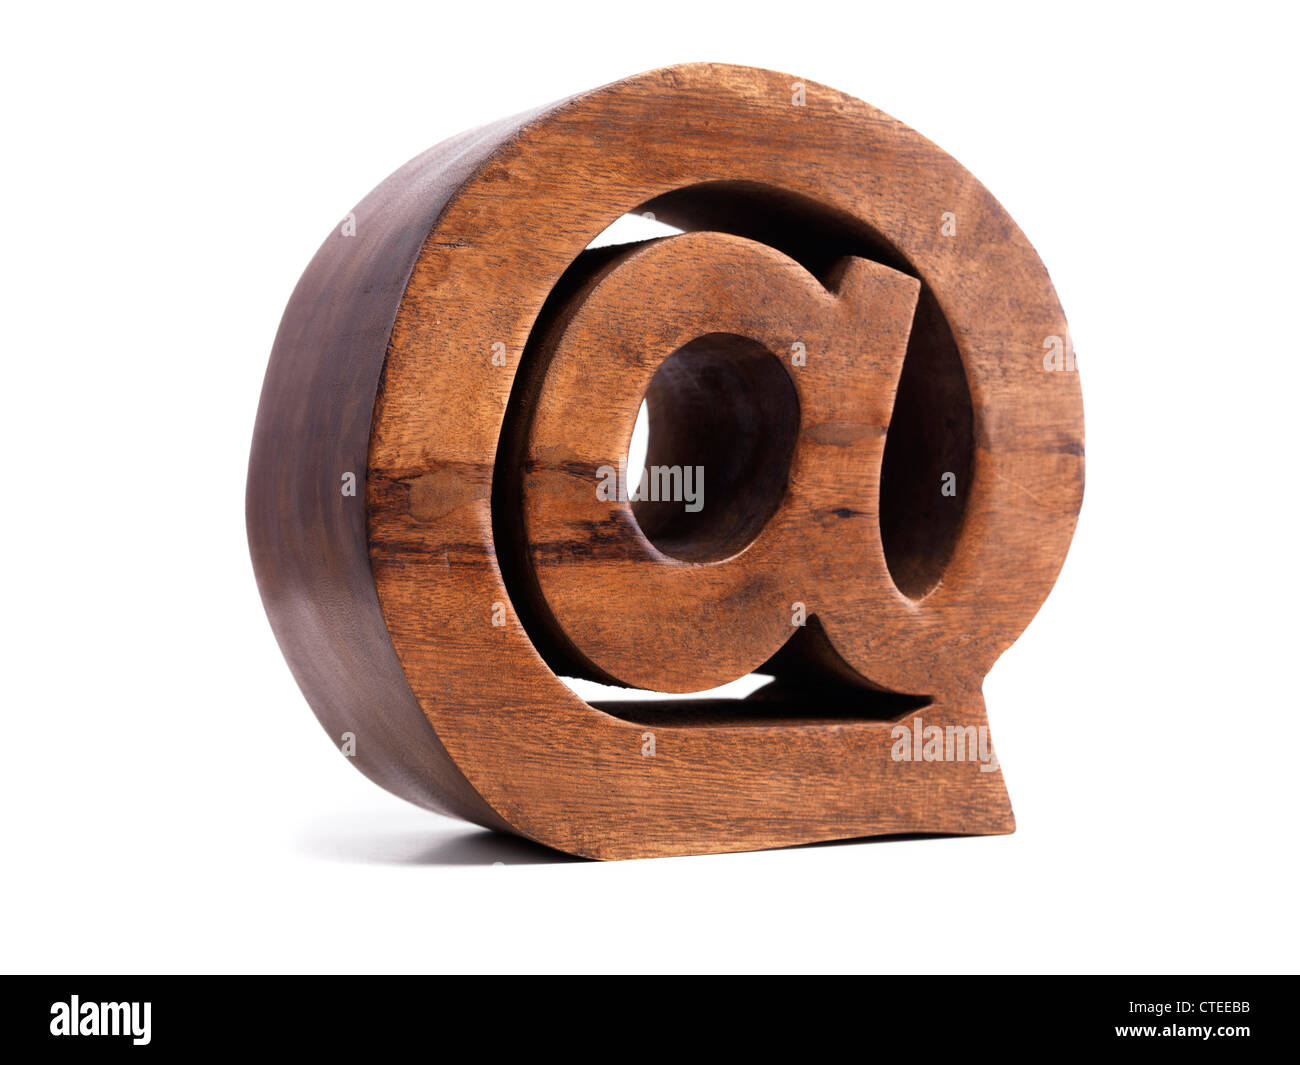 Email address symbol AT @ made of wood isolated on white background - Stock Image